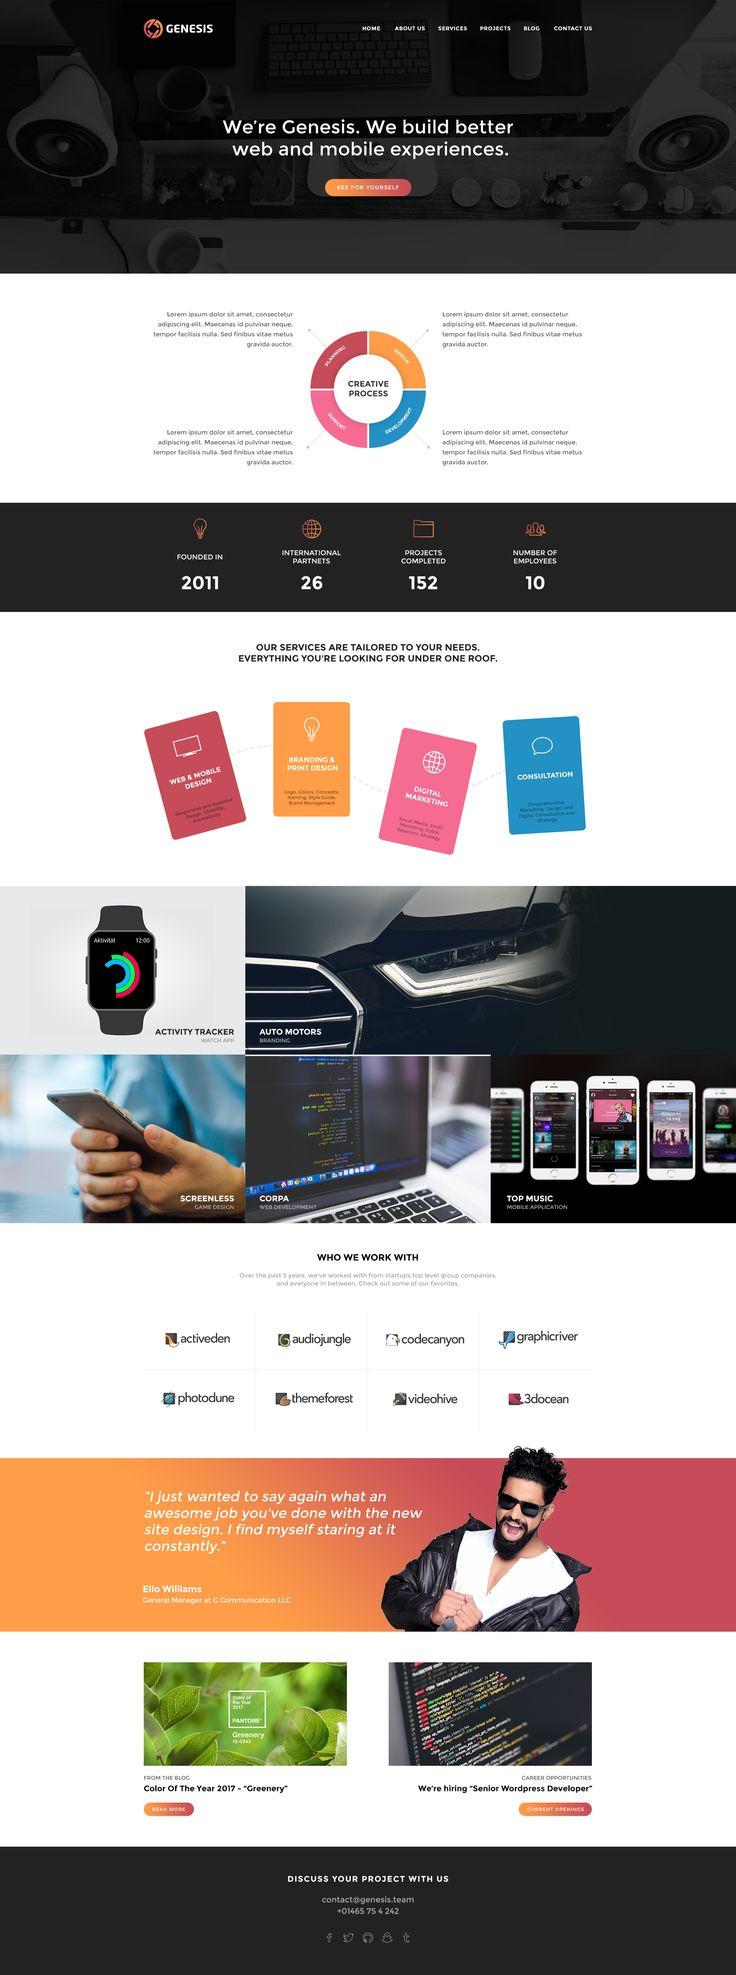 Genesis - Creative PSD Template by Geserjav | ThemeForest